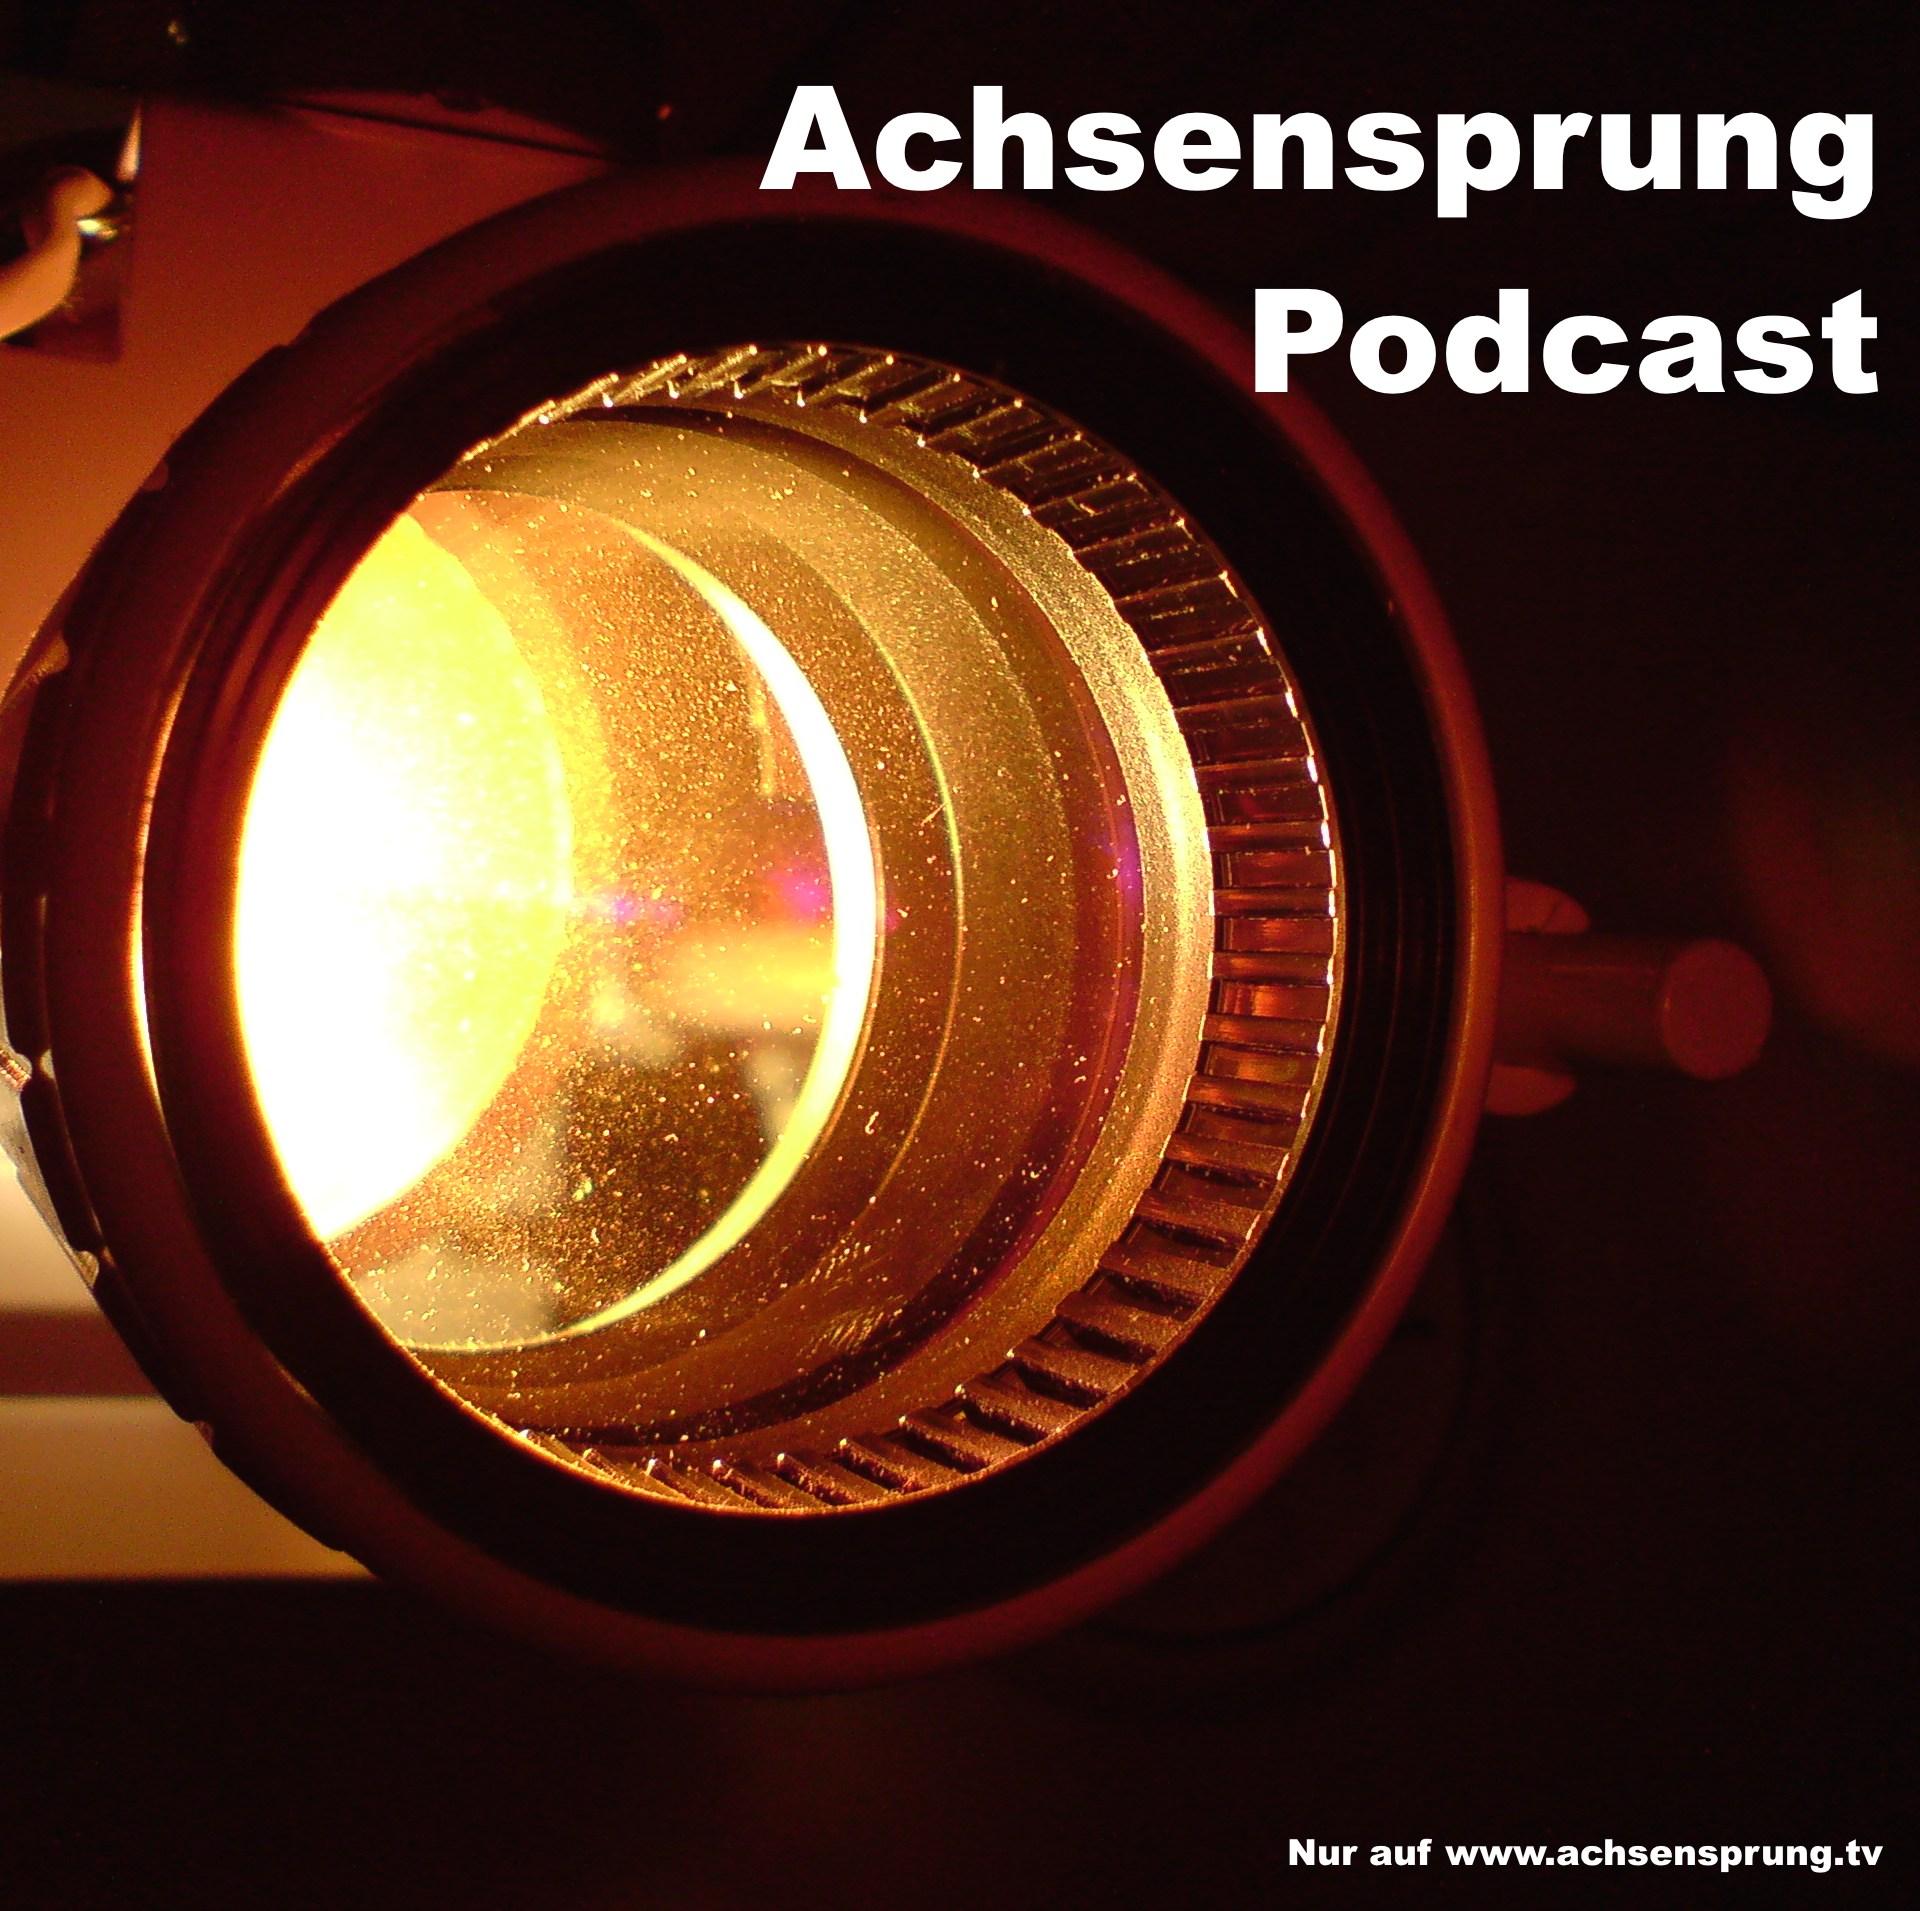 AchsensprungTV » Achsensprung